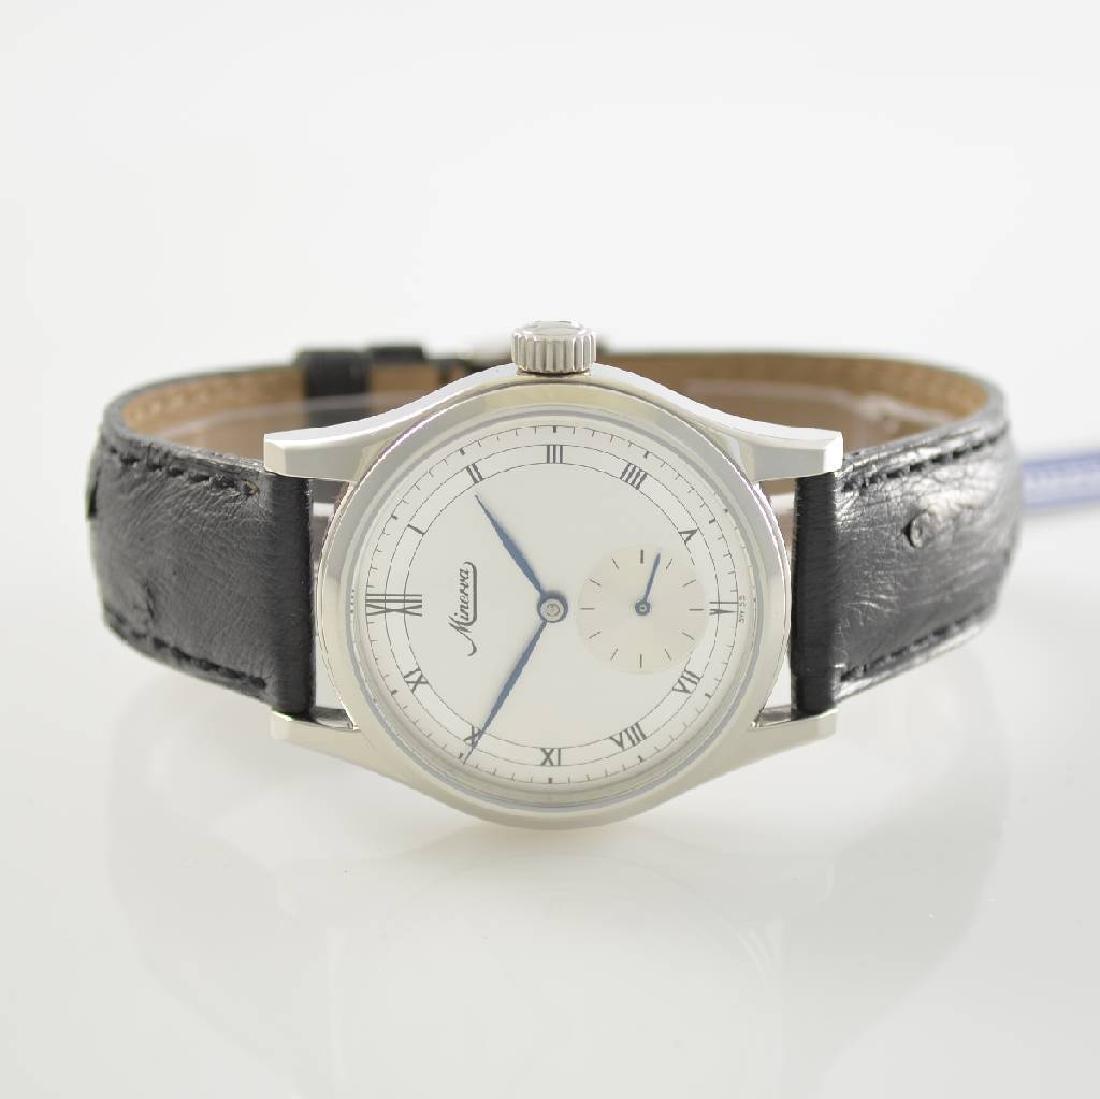 MINERVA calibre 48 gents wristwatch